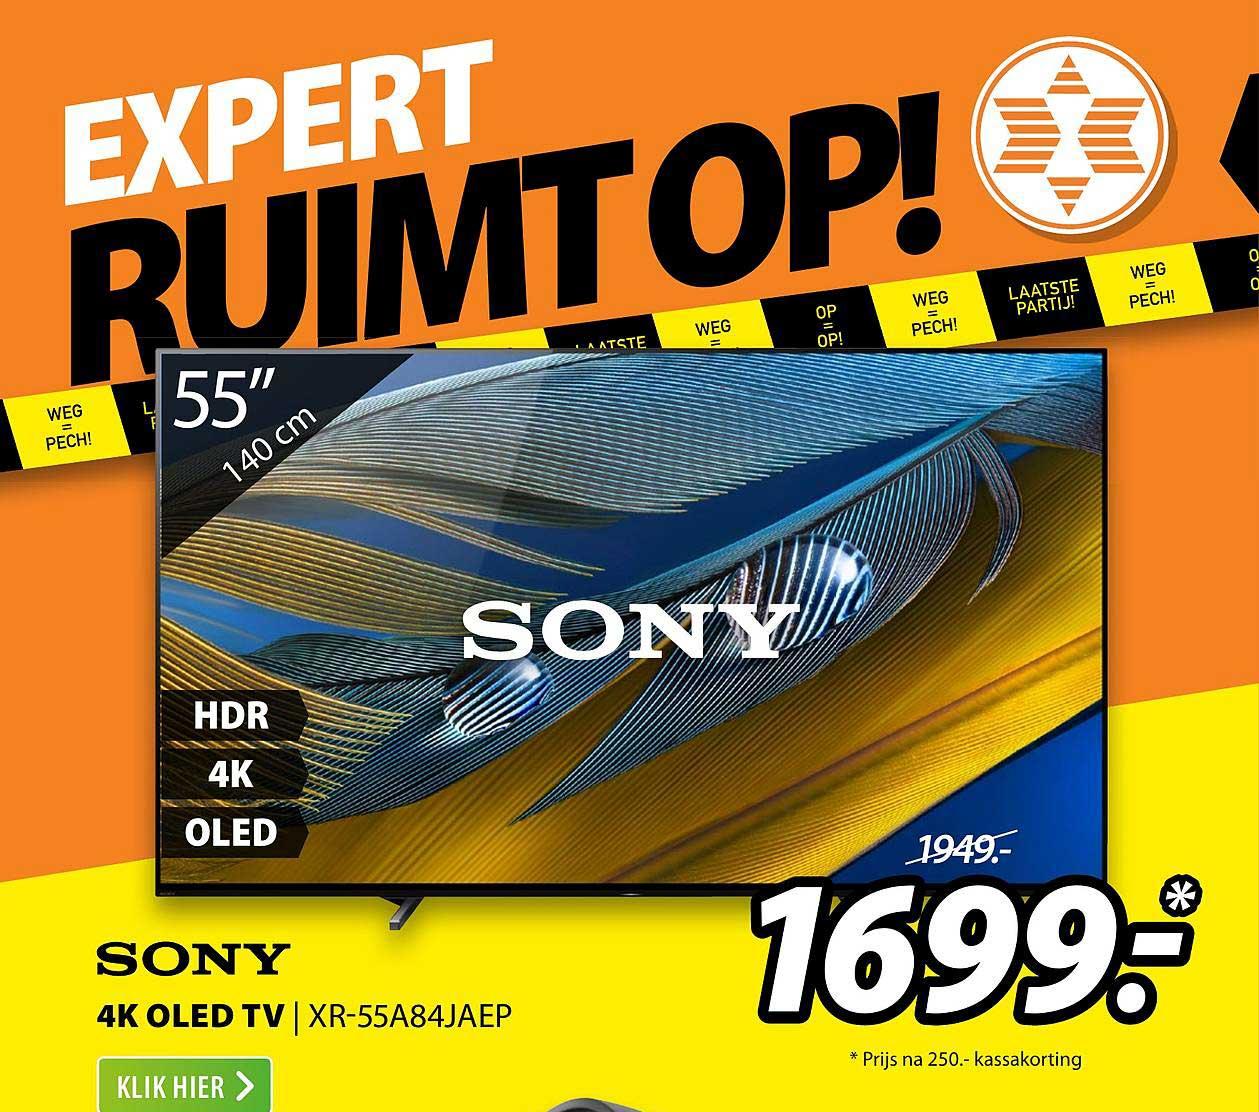 Expert Sony 4K OLED TV | XR-55A84JAEP